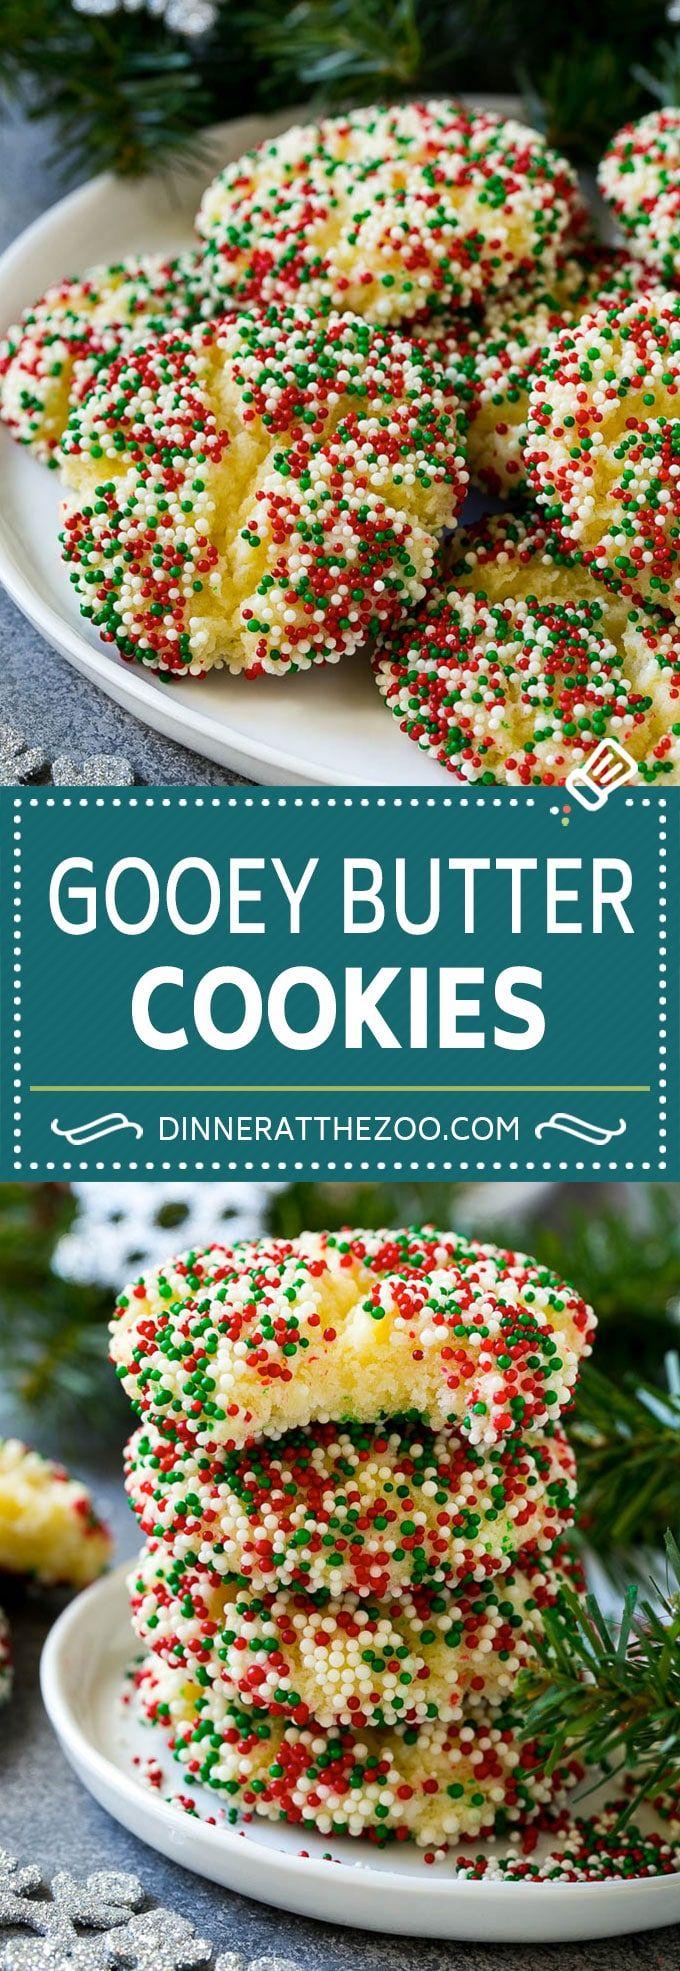 Gooey Butter Cookies Recipe   Cake Mix Cookies   Sprinkle Cookies   Christmas Co…